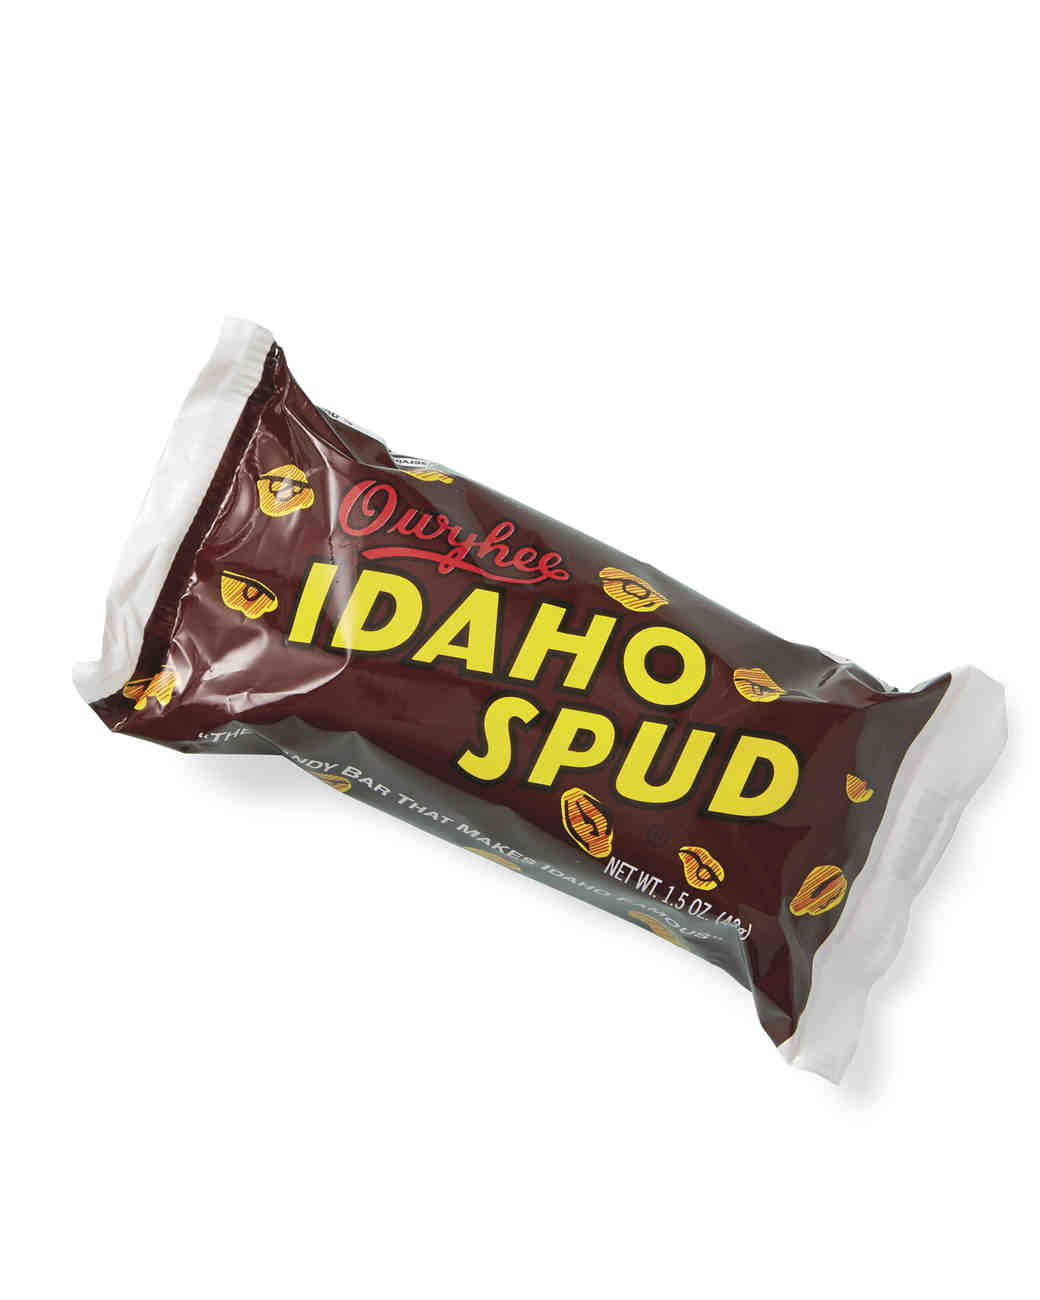 idaho-id-spud-one-043-d111965.jpg